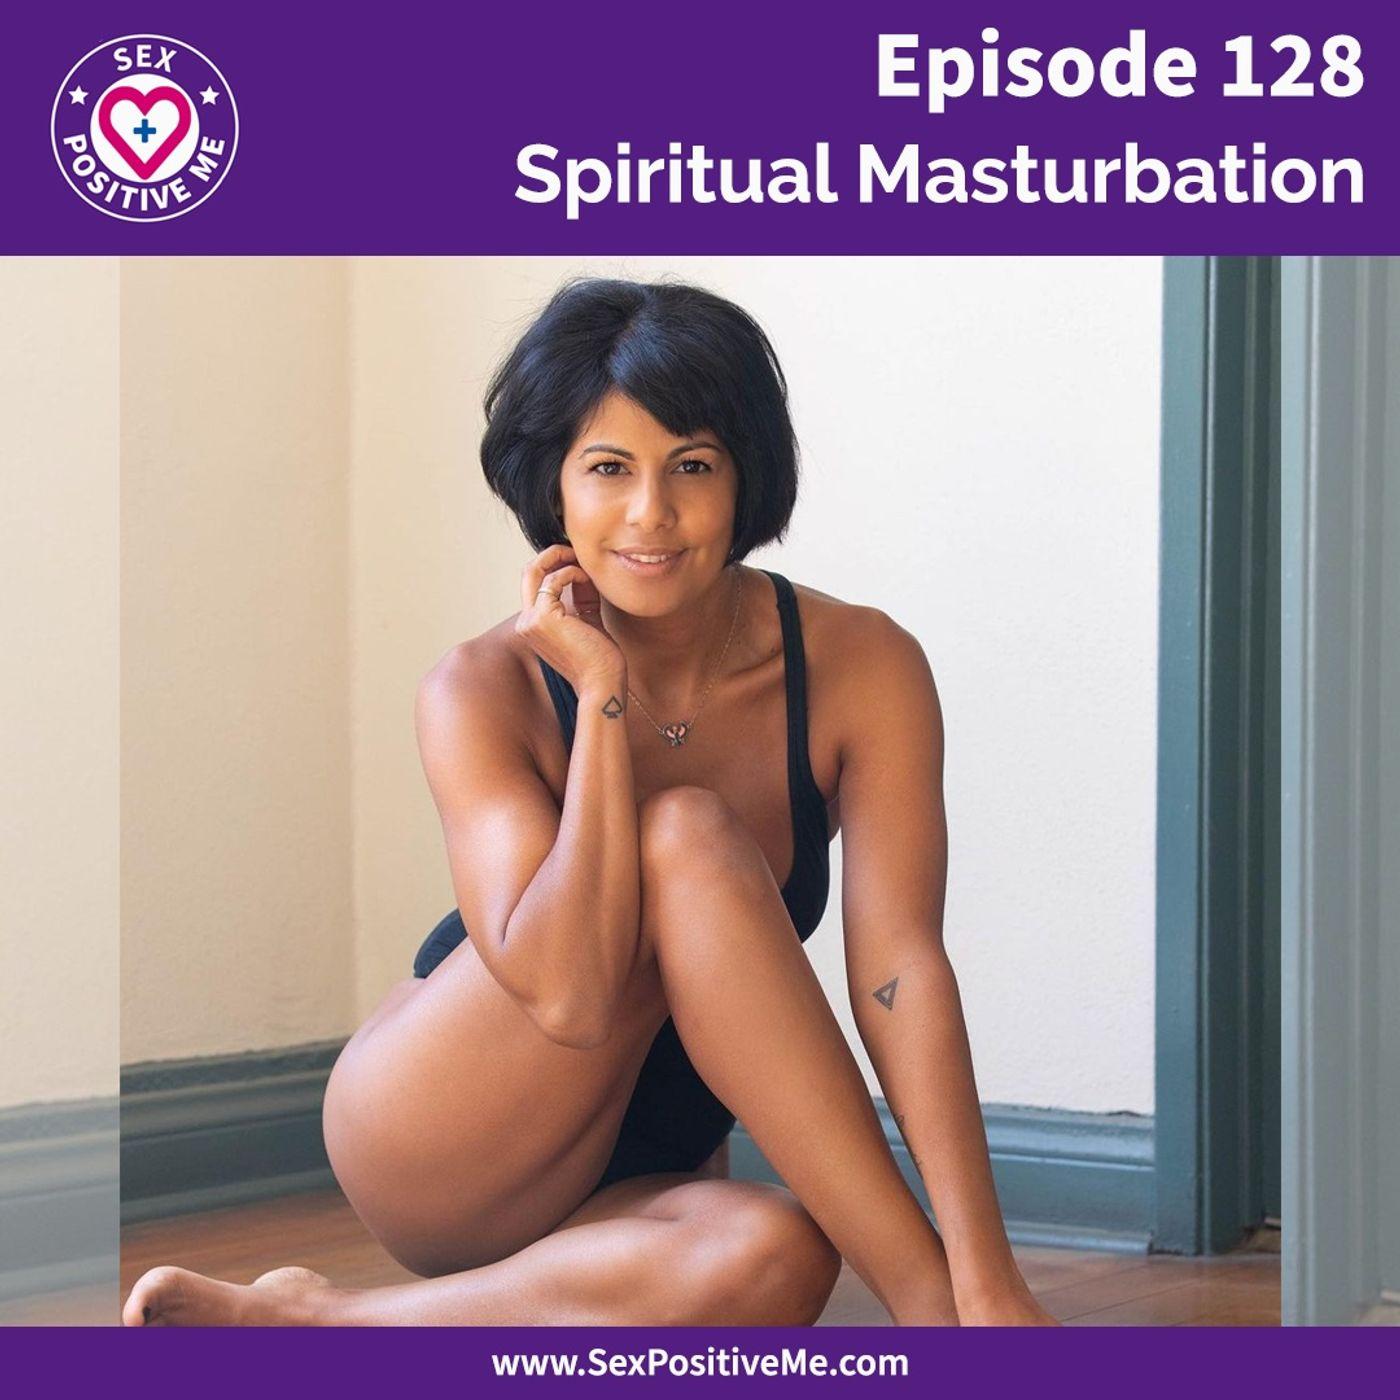 Sex Positive Me - E128: Spiritual Masturbation